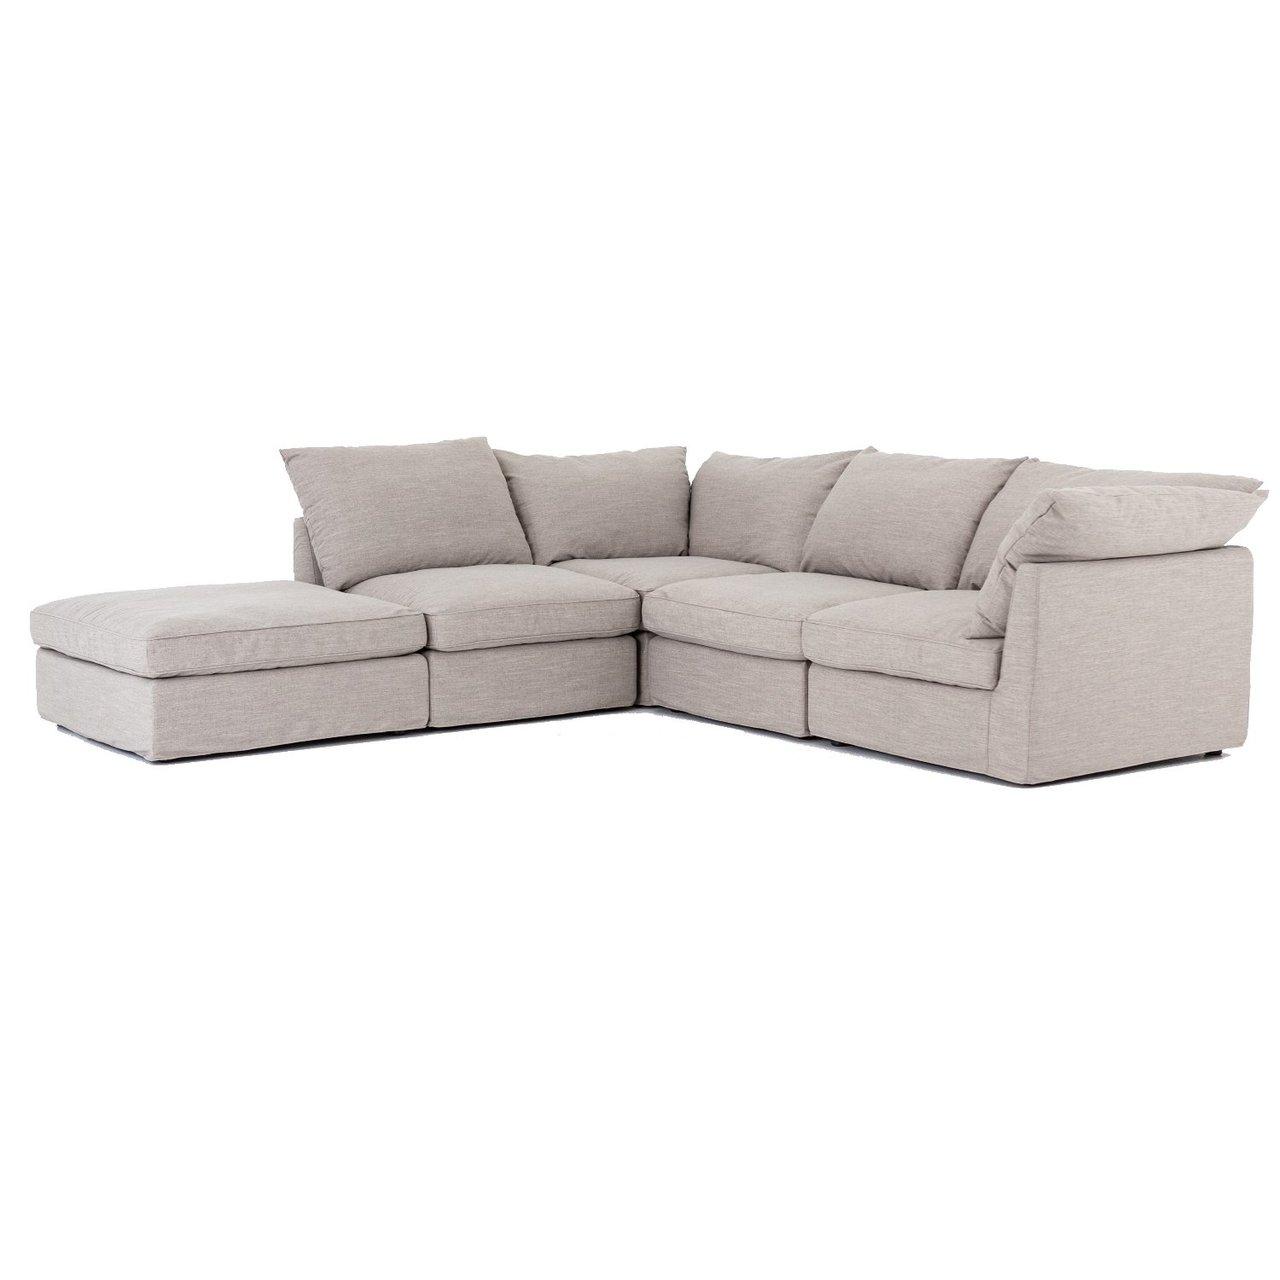 Paul Coastal Grey 5 Piece Modular Sectional Sofa Zin Home Fourhands